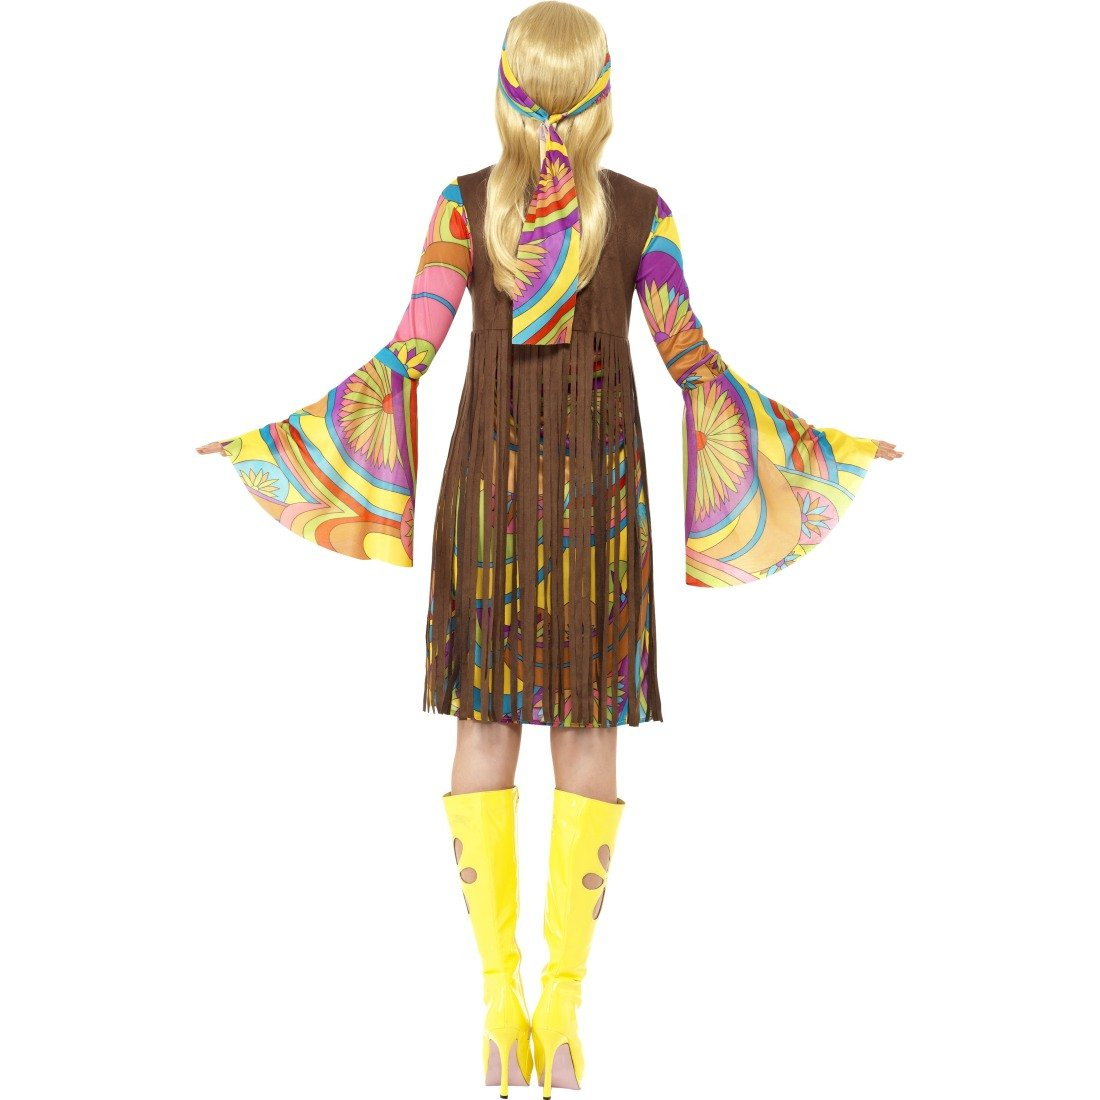 Colourido disfraz de equipo 70er hippie años vestido de neón 60 ...